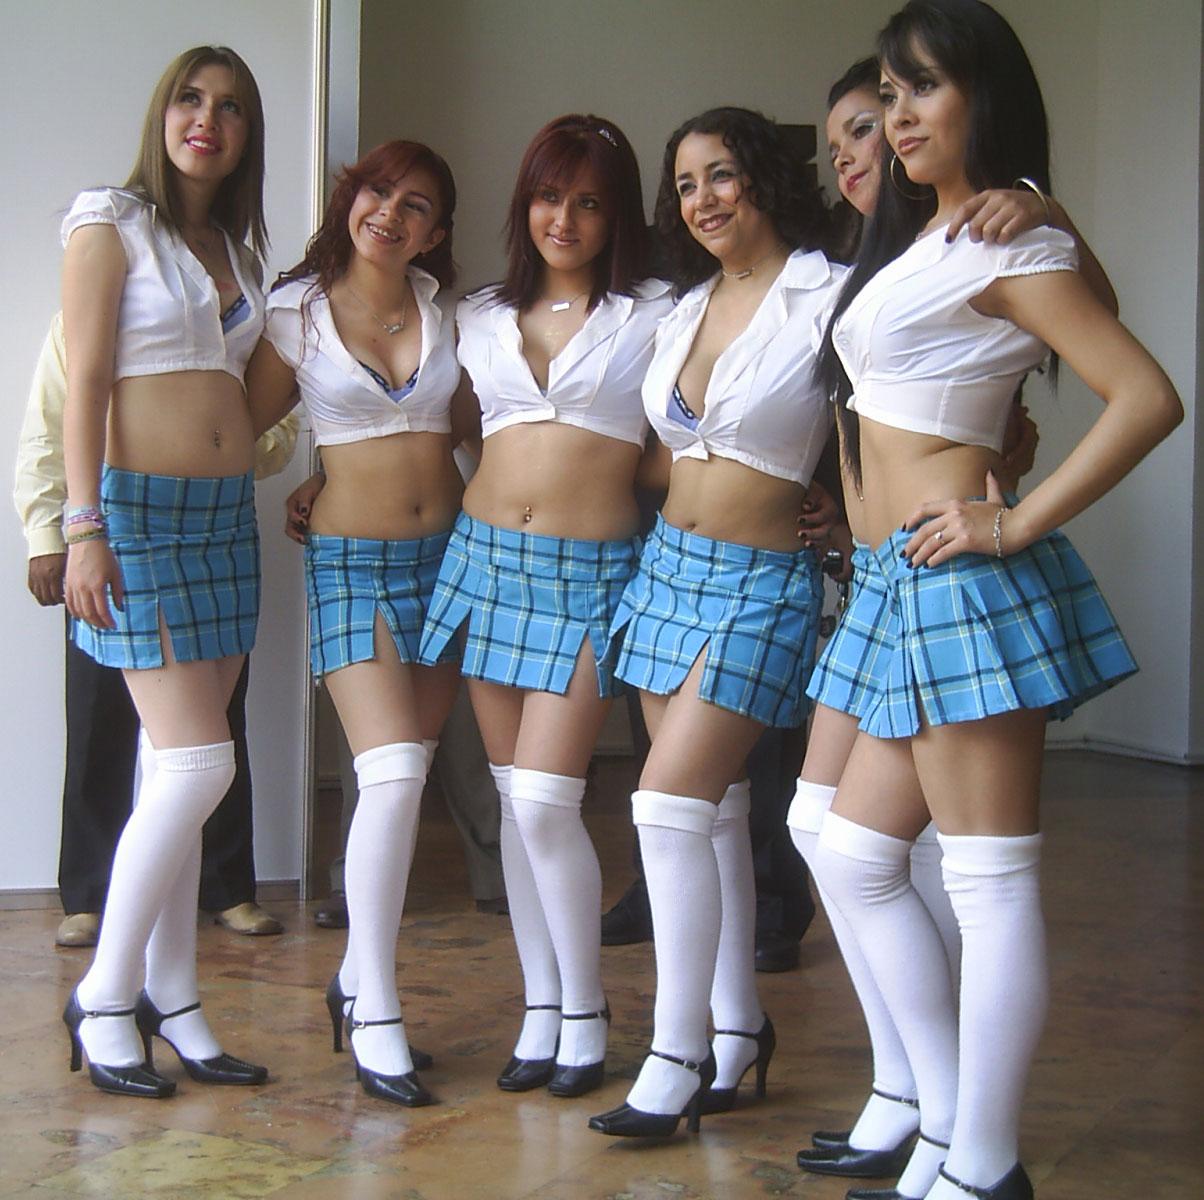 la cosa mas cara del mundo estudiantes prostitutas